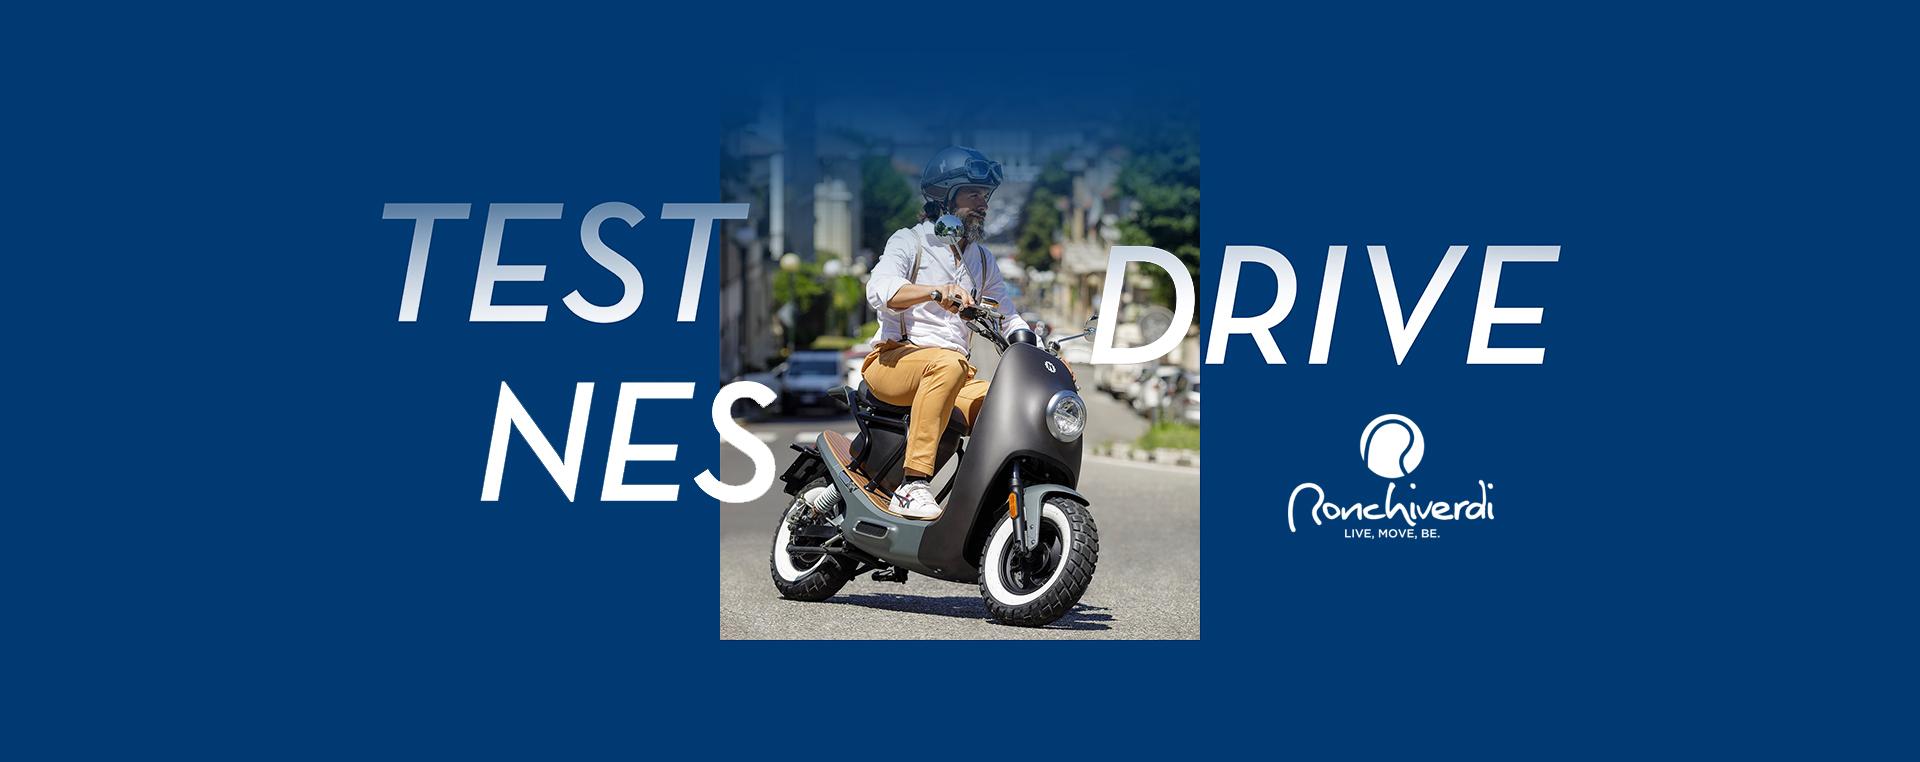 test drive ronchi seconda pagina news (003)